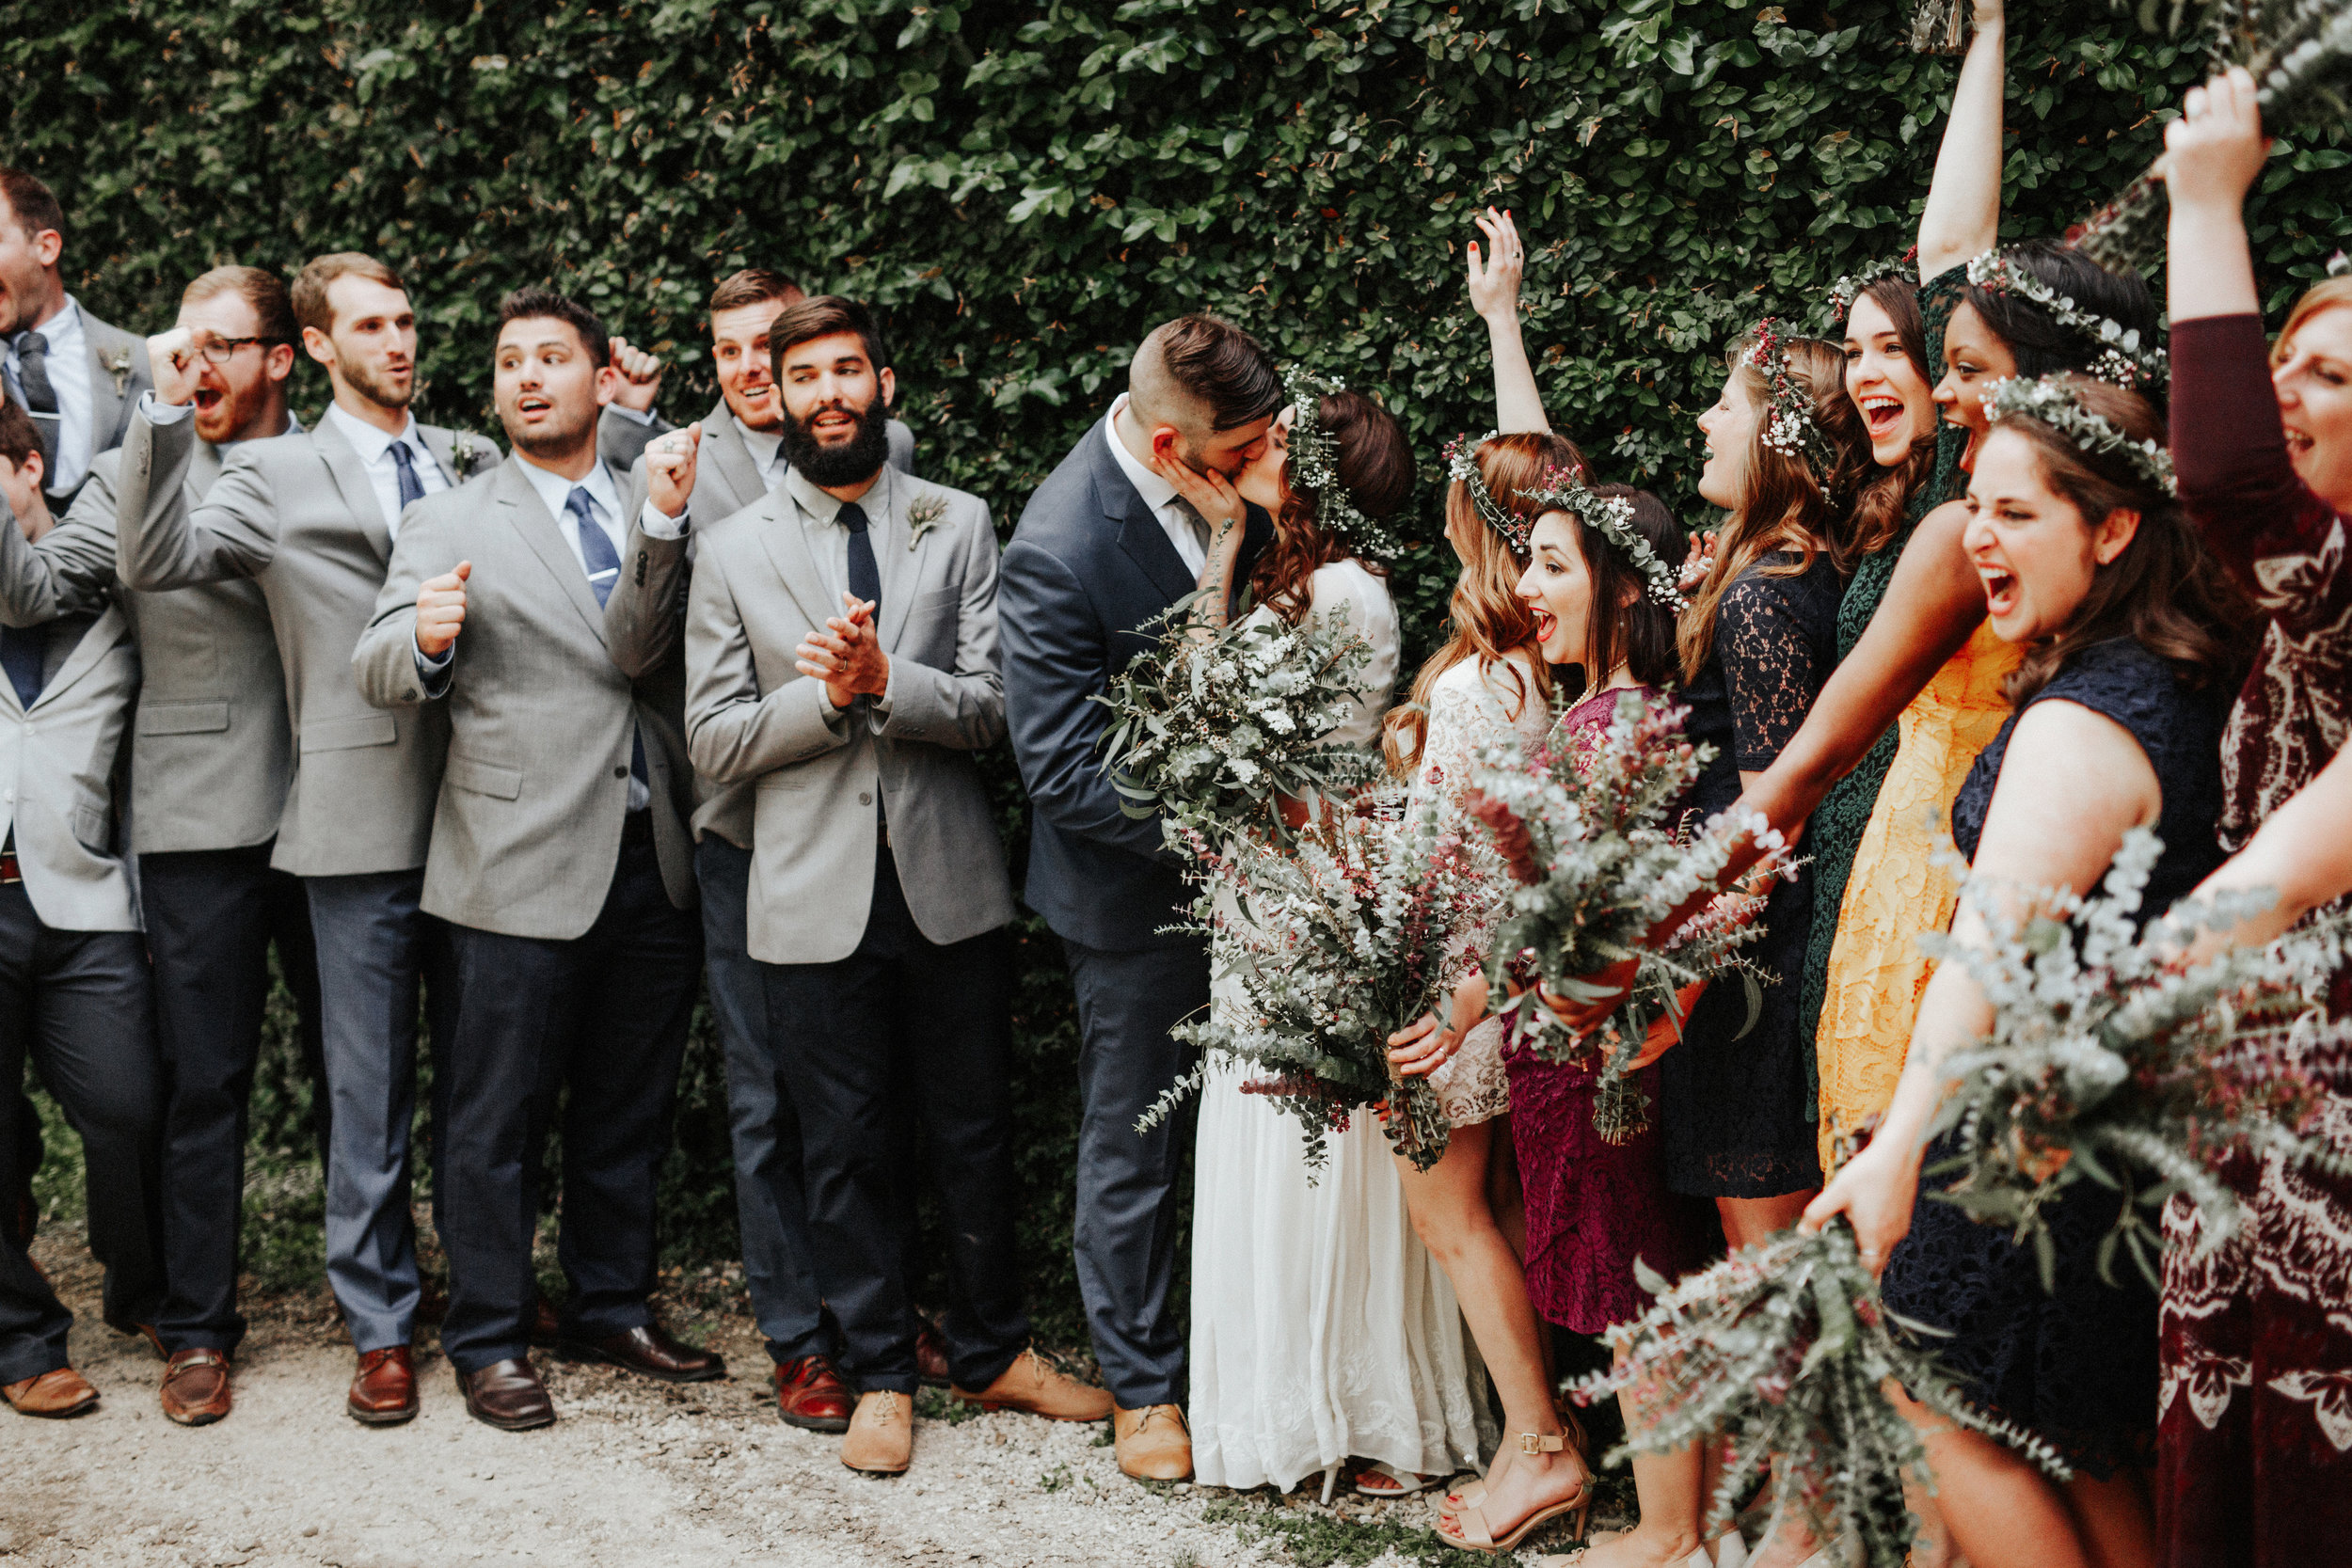 austin-wedding-photographer-38.jpg